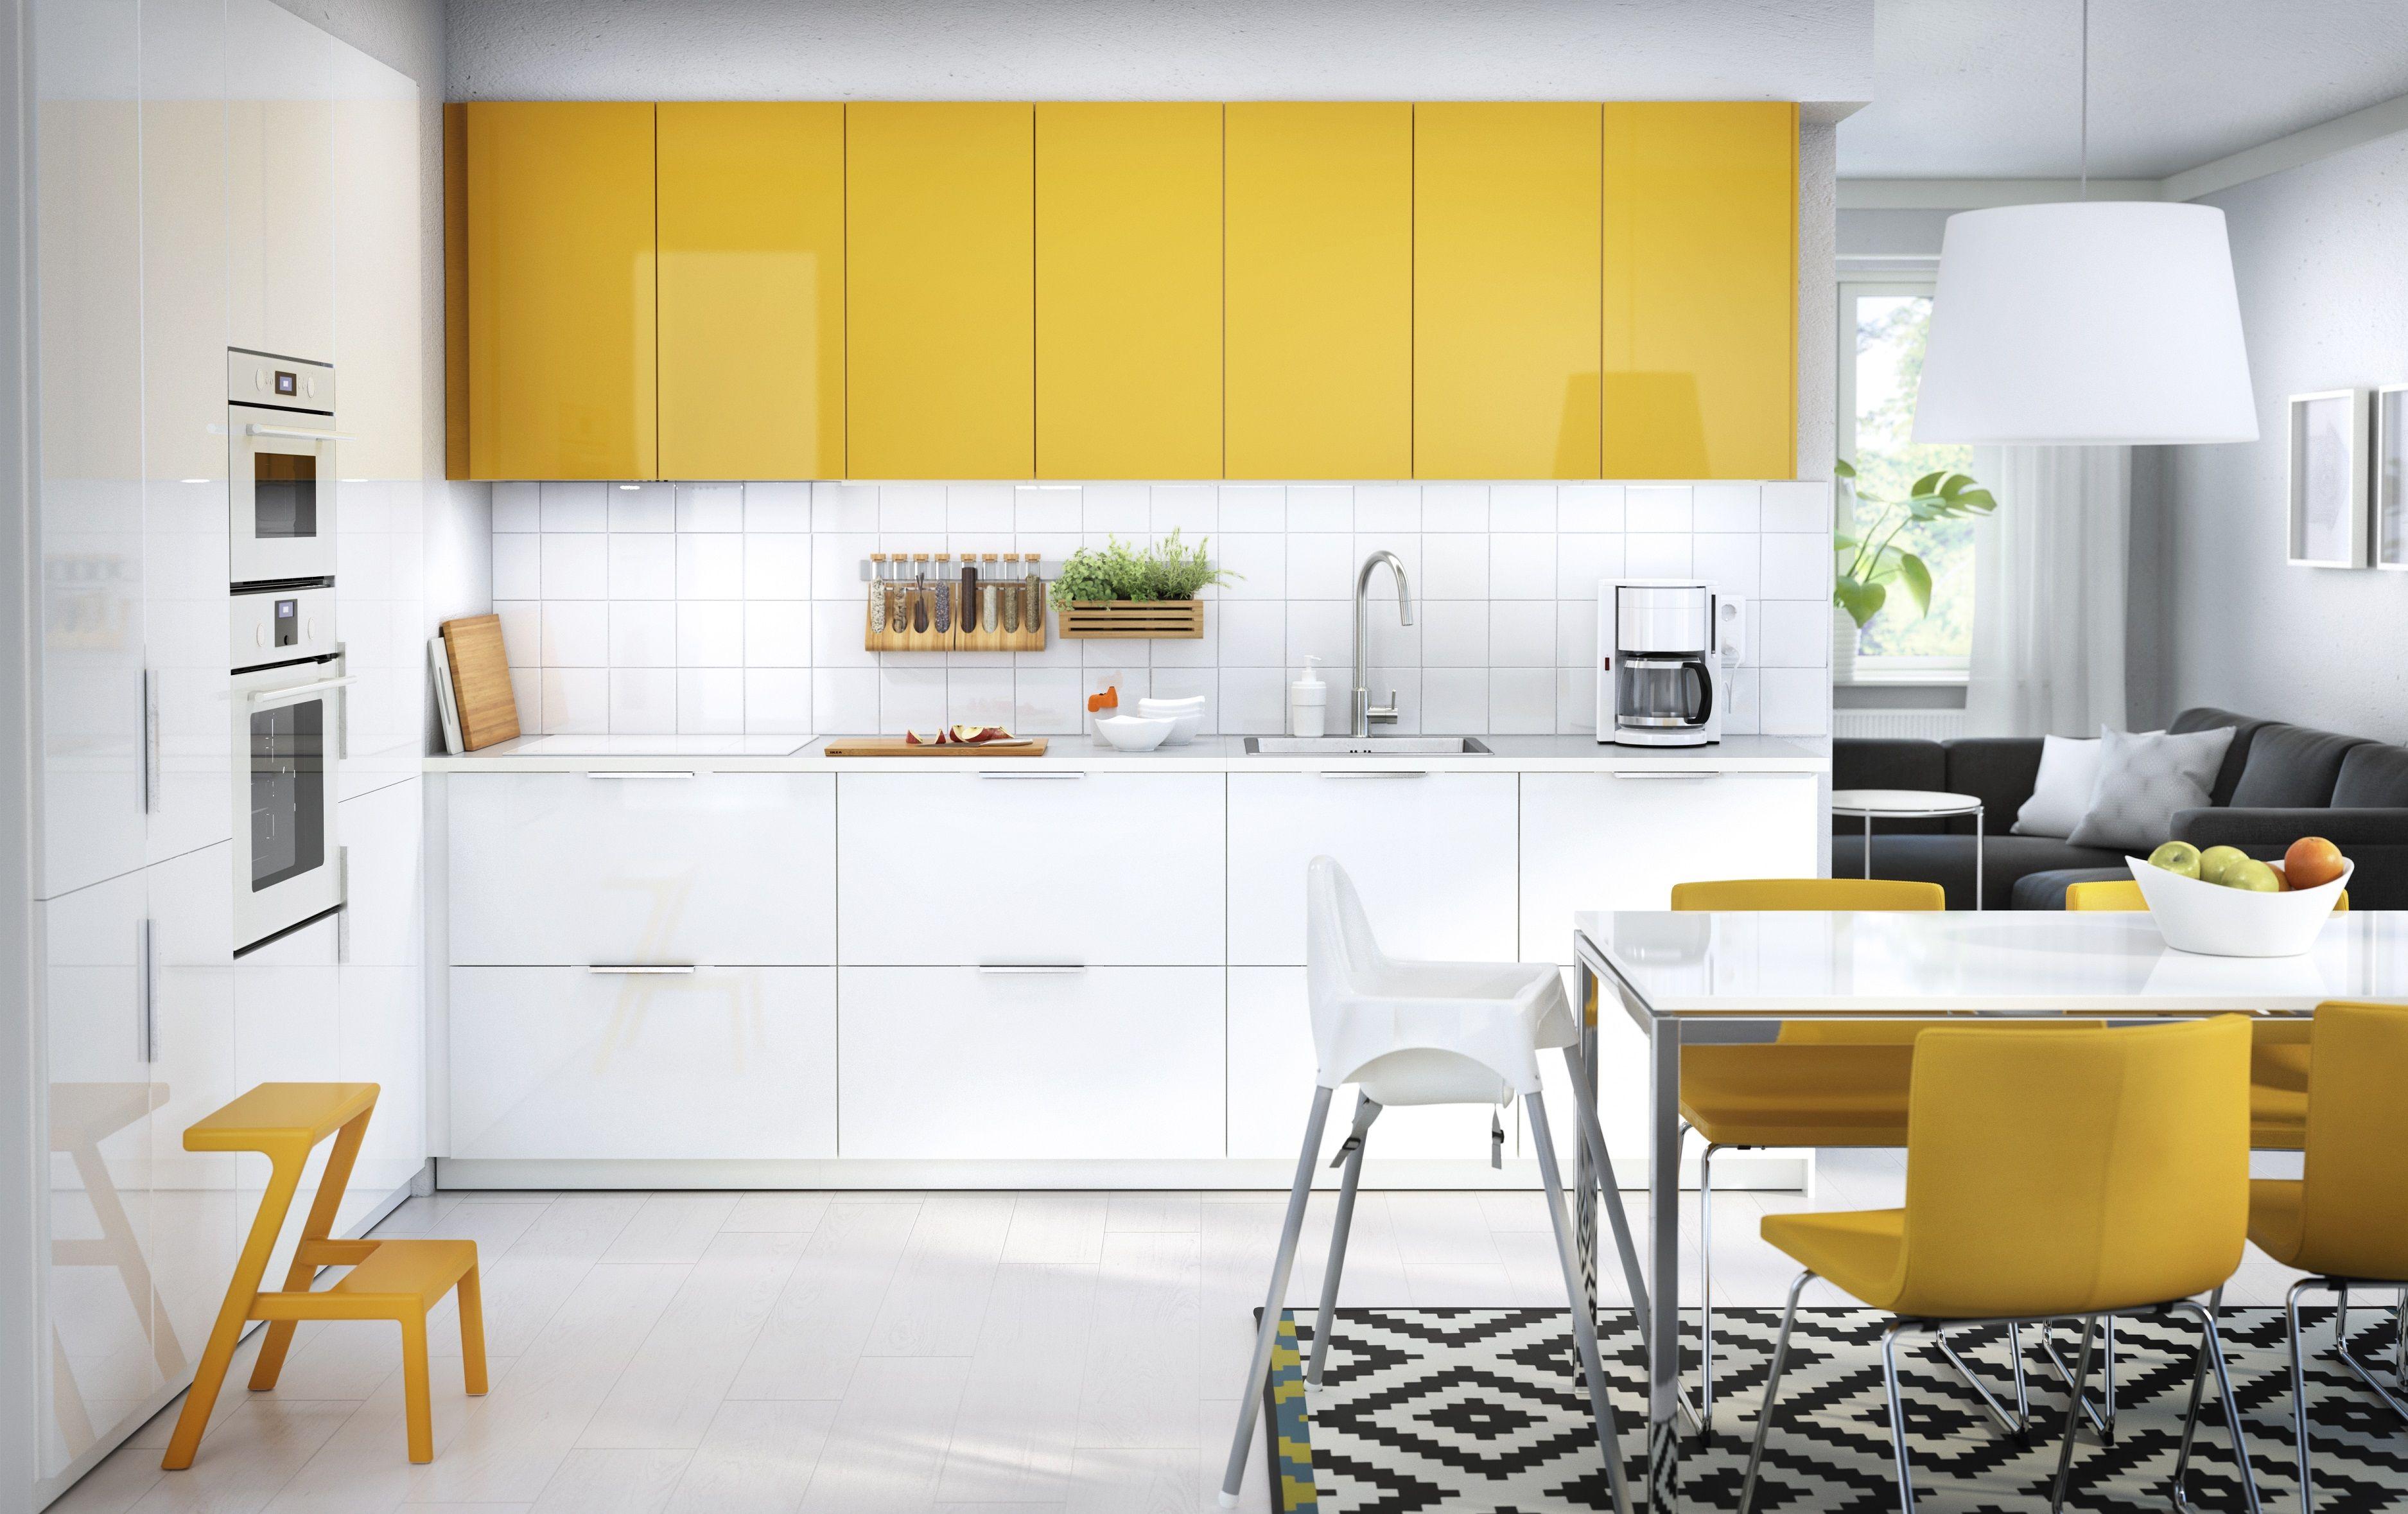 Metod Keuken Ikea : Ikea keuken hoogglans wit ikea keukenkastjes verven informatie